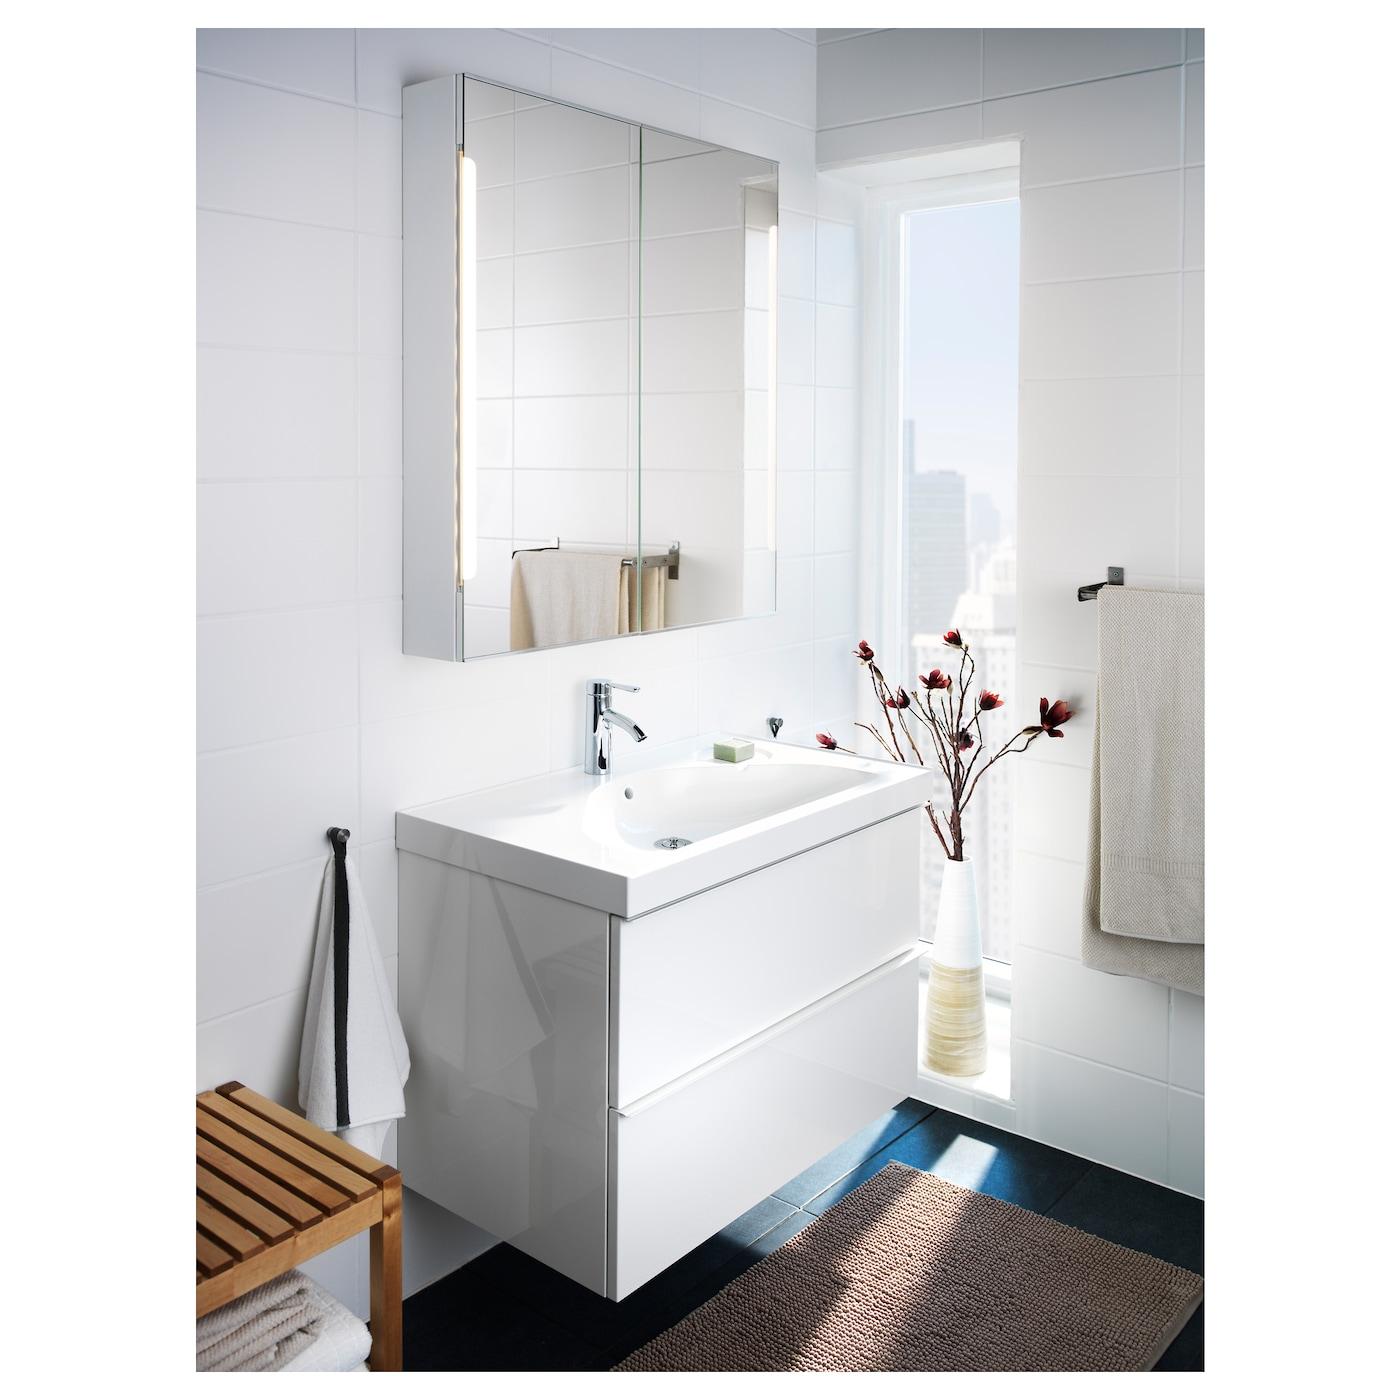 Storjorm Mirror Cabinet W 2 Doors Light White 31 1 2x5 2x37 3 4 Ikea